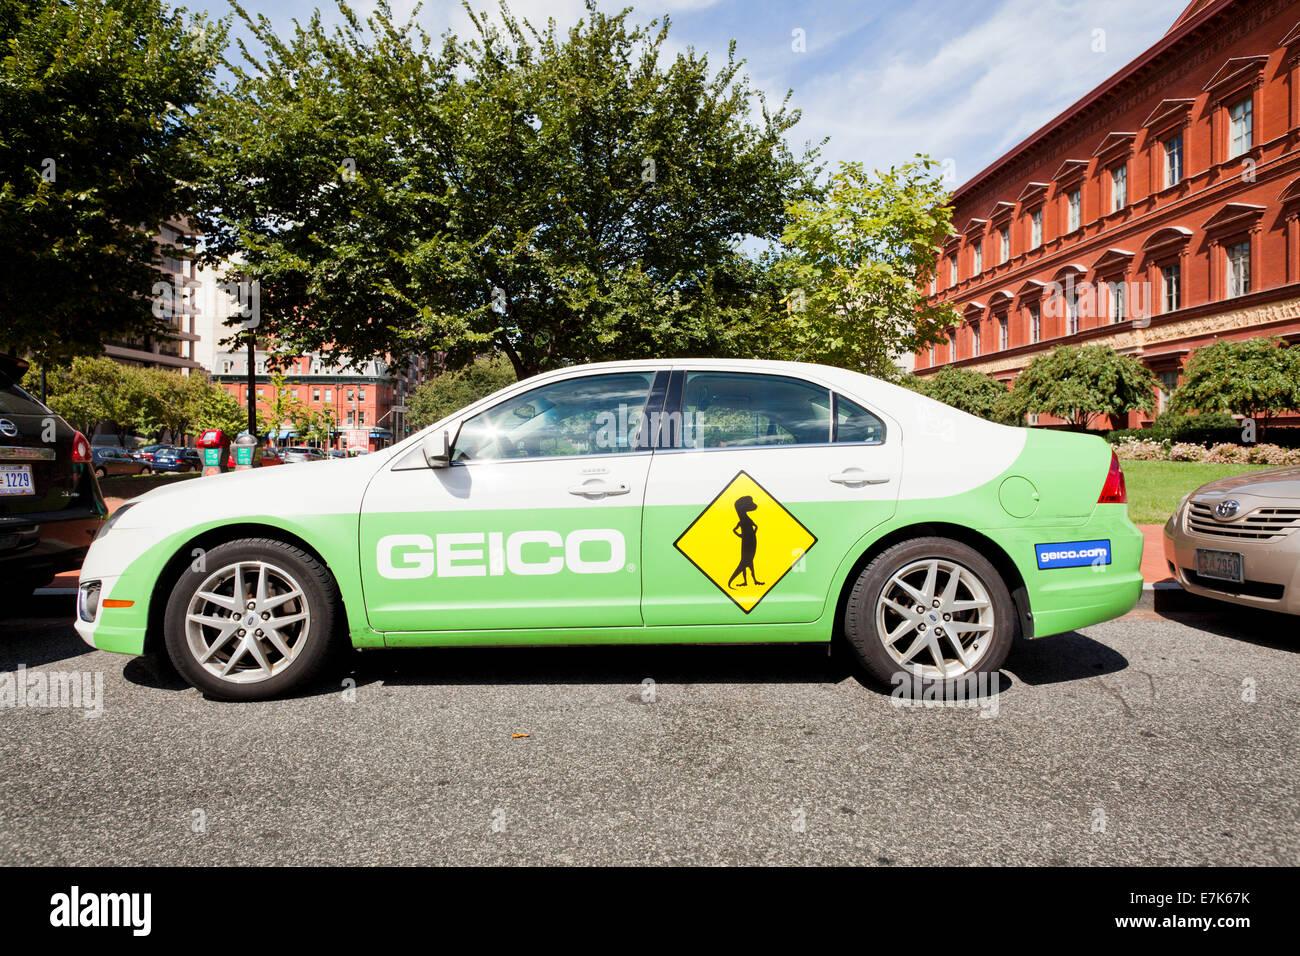 Insurance company stock photos insurance company stock images geico insurance company car washington dc usa stock image biocorpaavc Choice Image